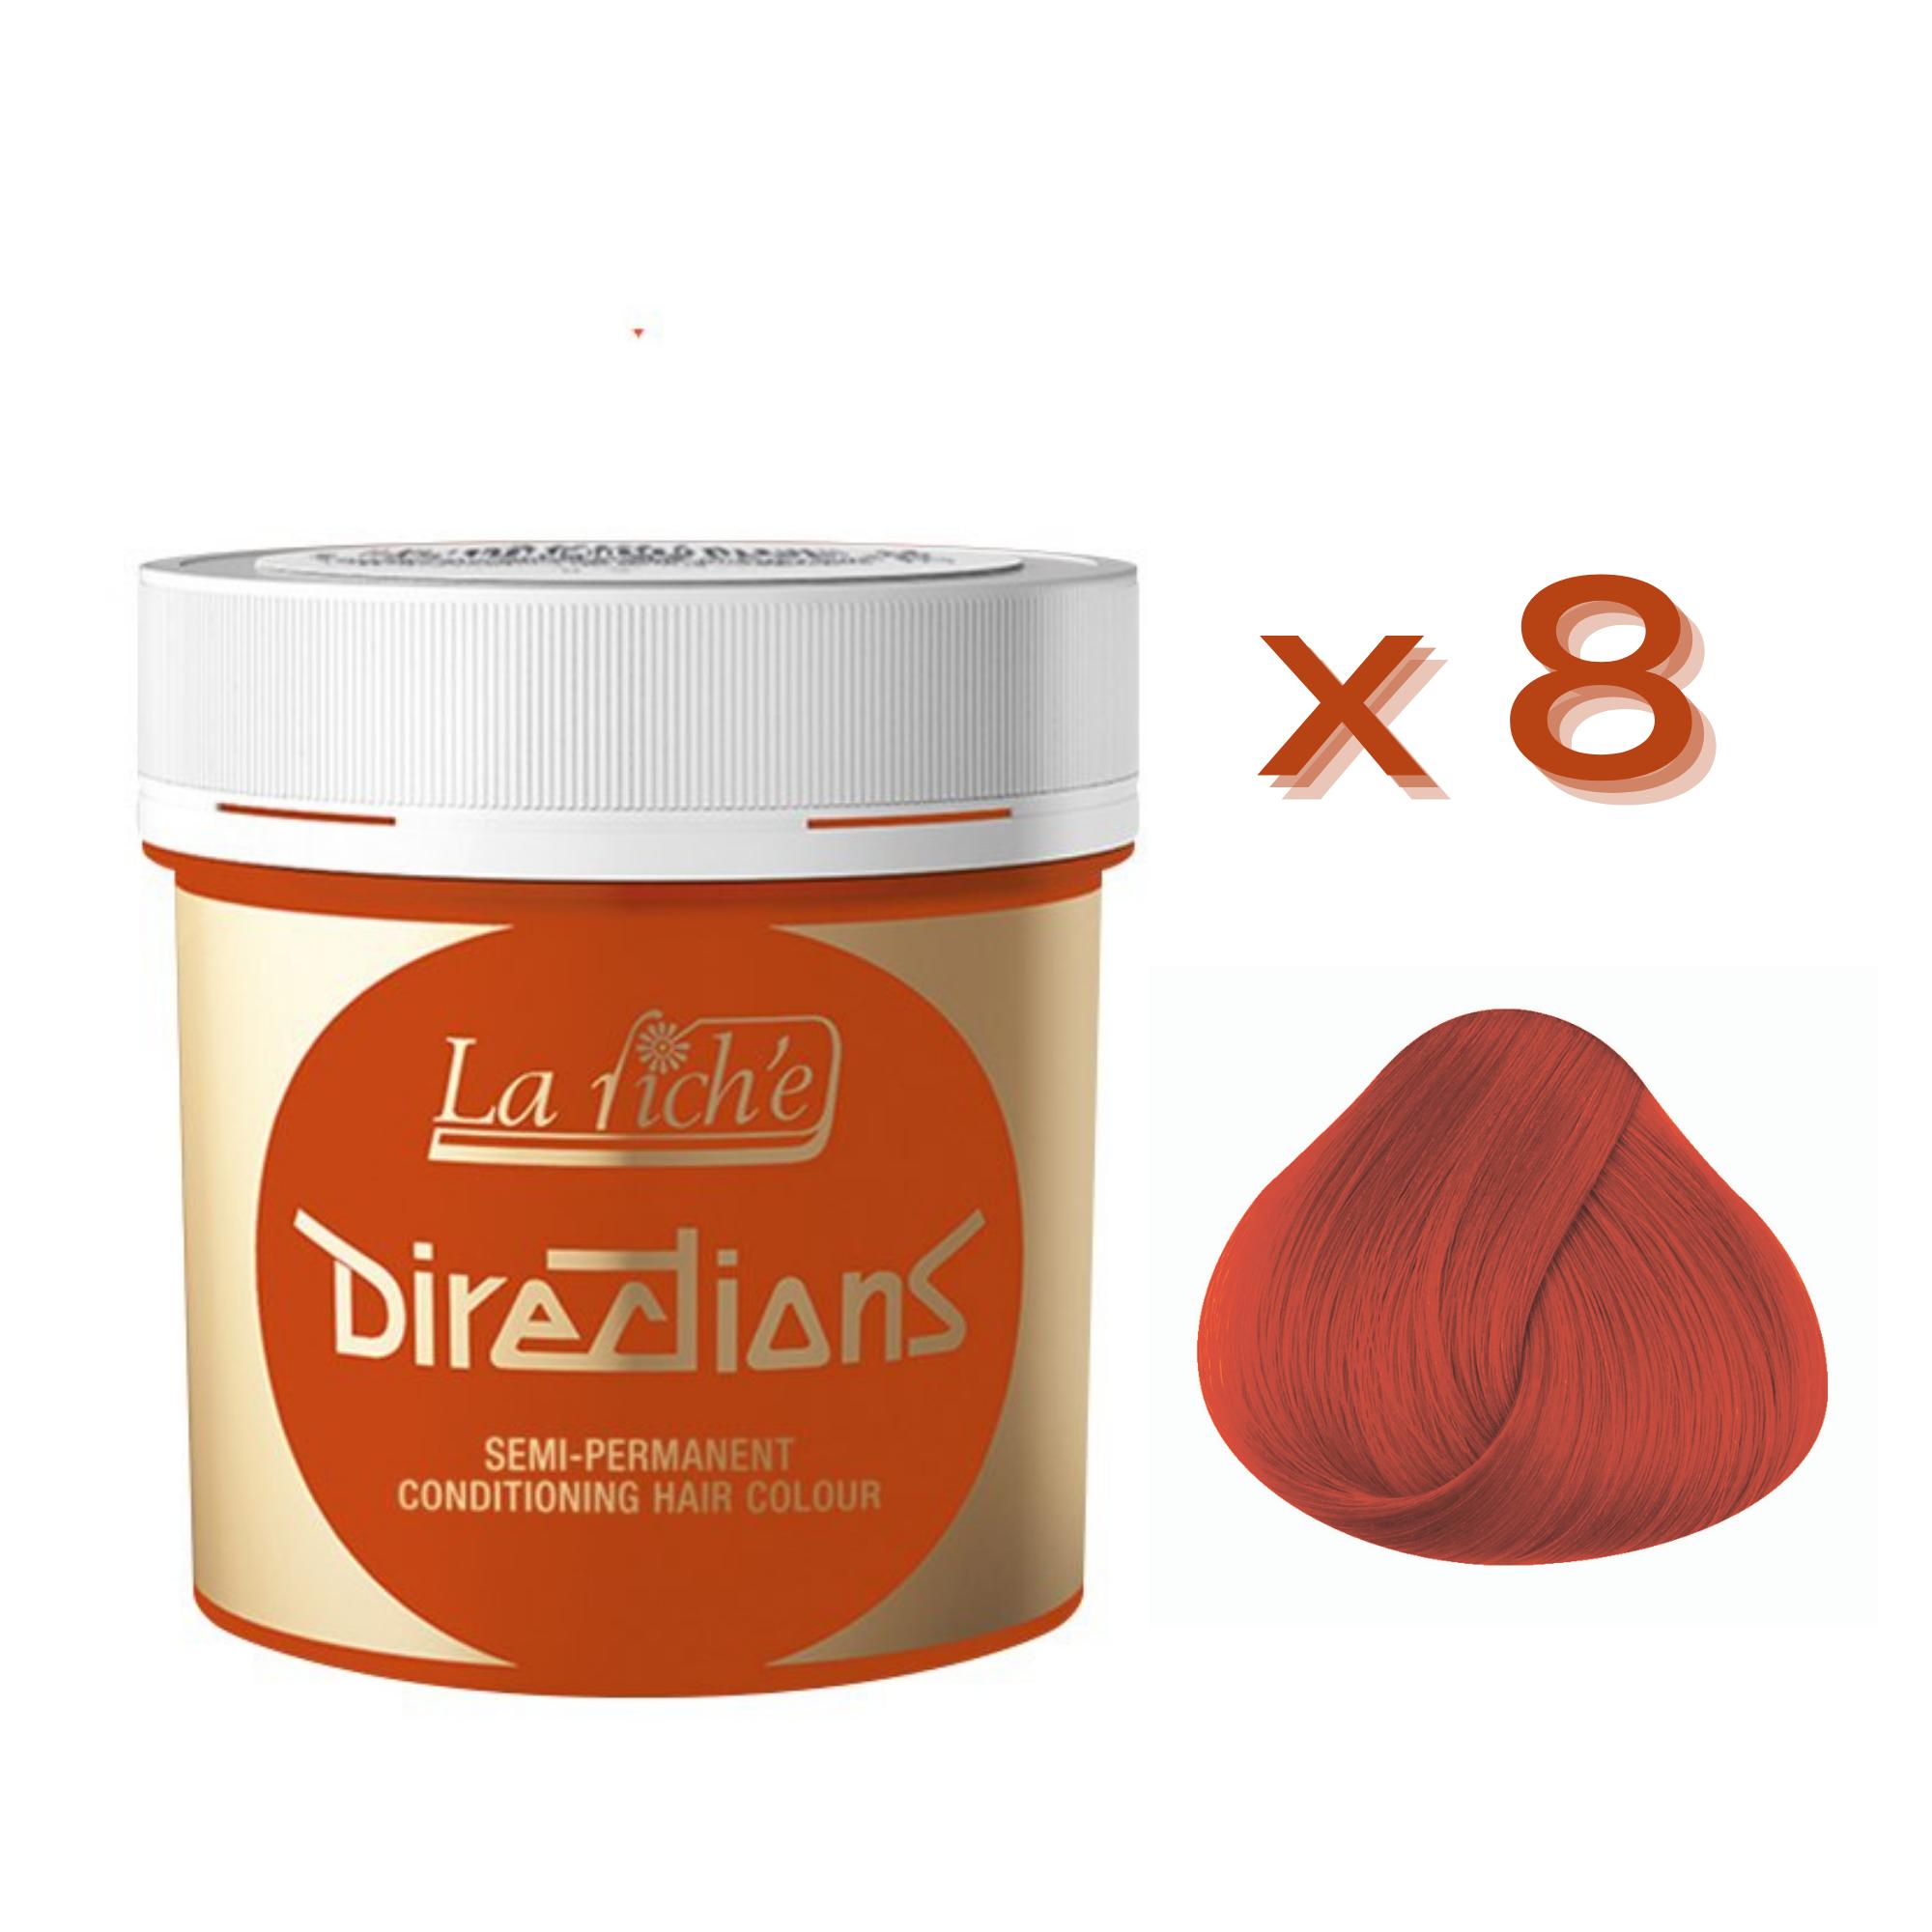 8 x La Riche Directions Semi-Permanent Hair Color 88ml Tubs - TANGERINE